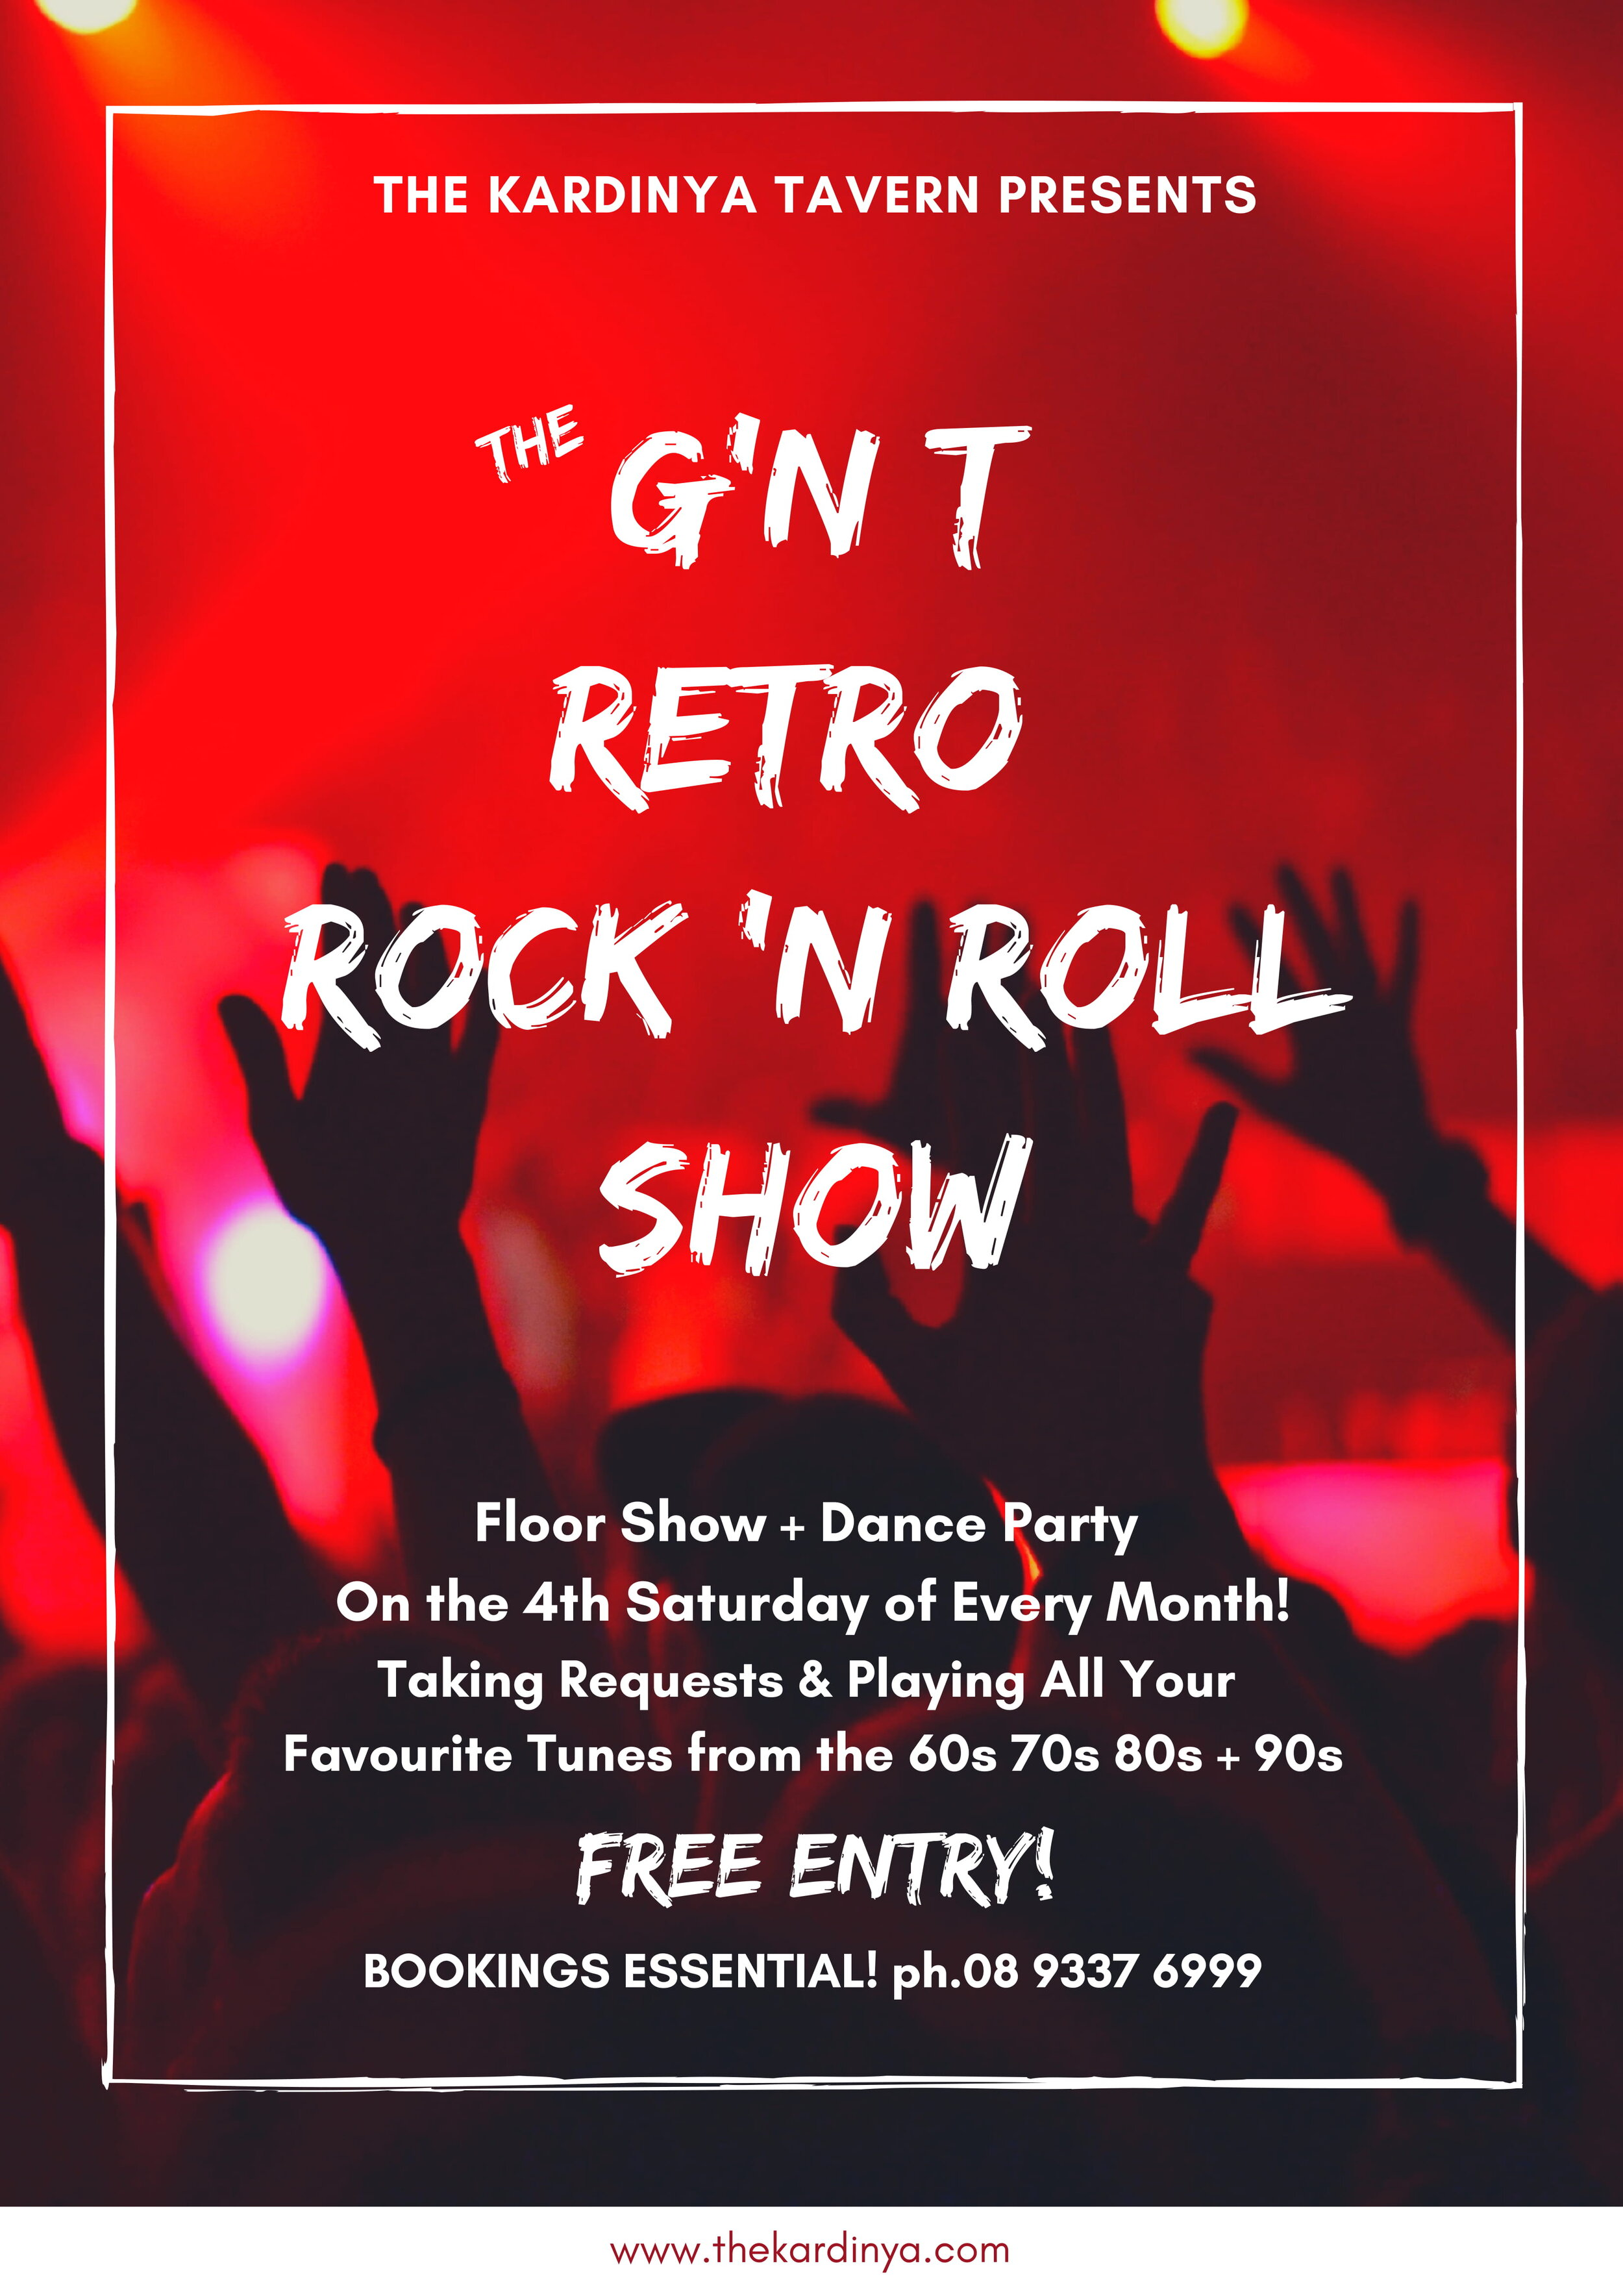 Retro Rock n Roll Show Posters (3)-1.jpg